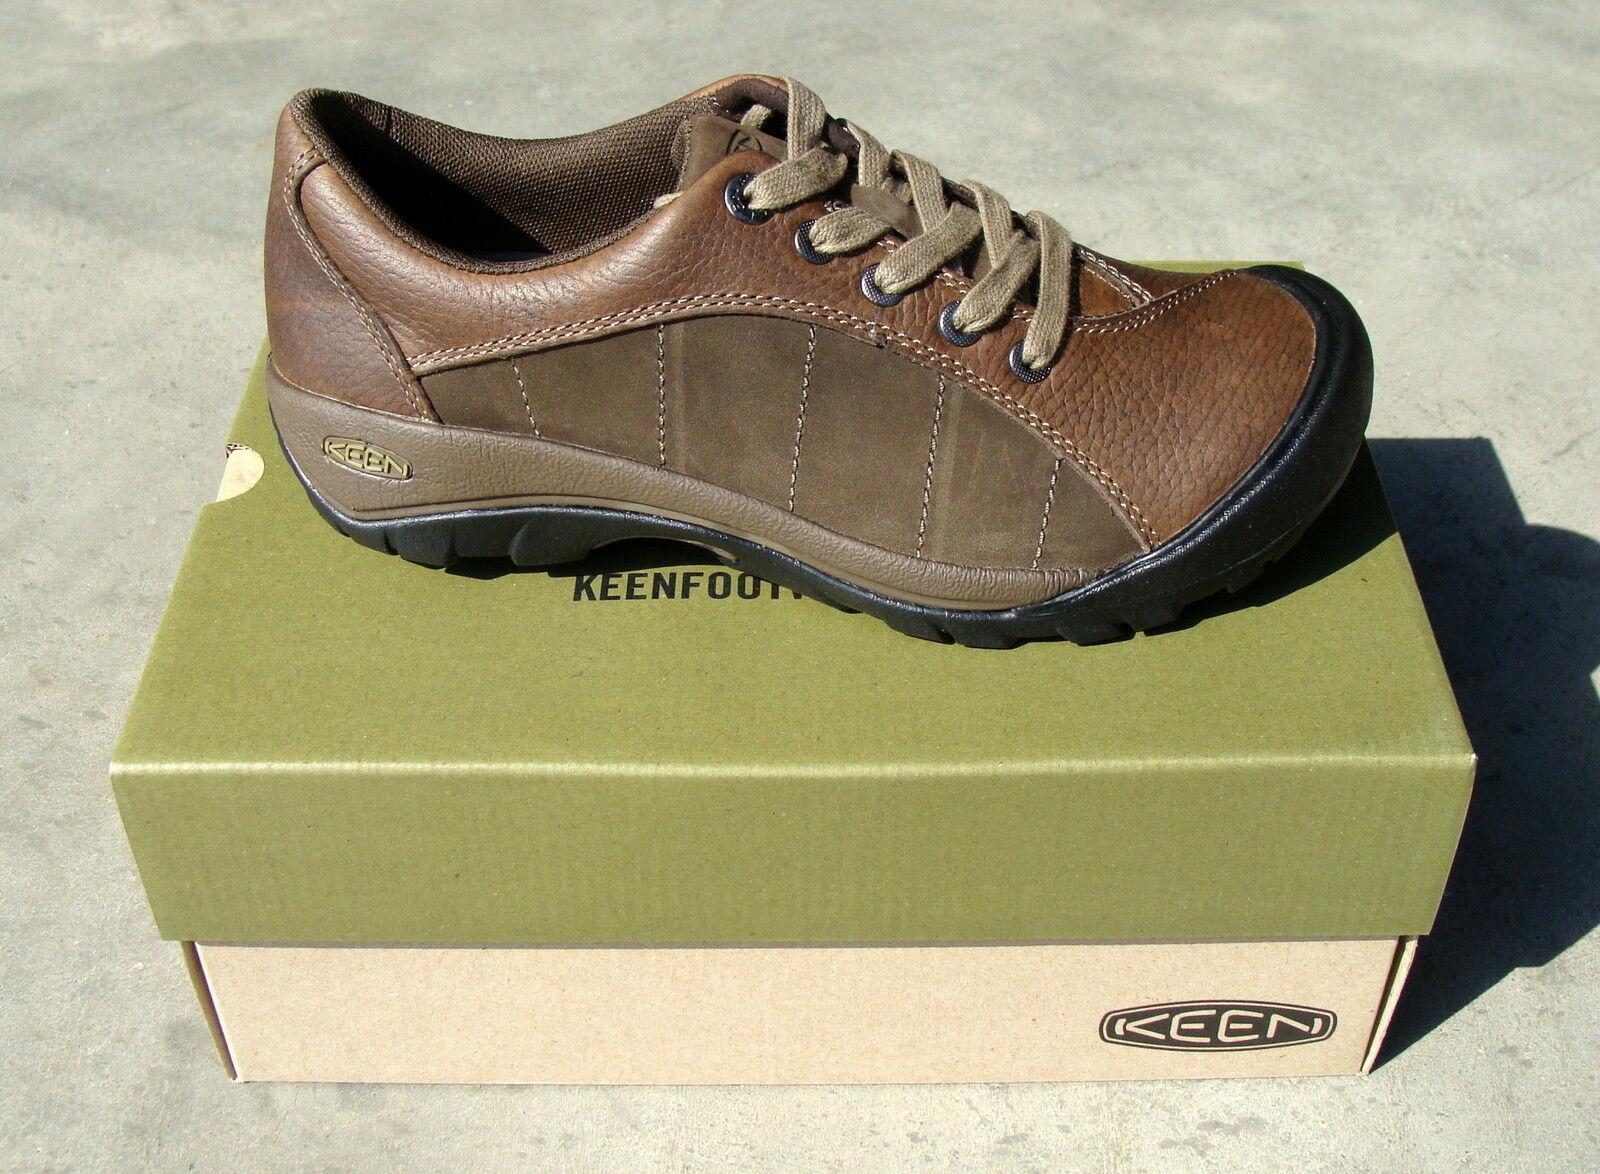 Keen Women's Presidio shoes - Cascade Brown   Shitake - 10